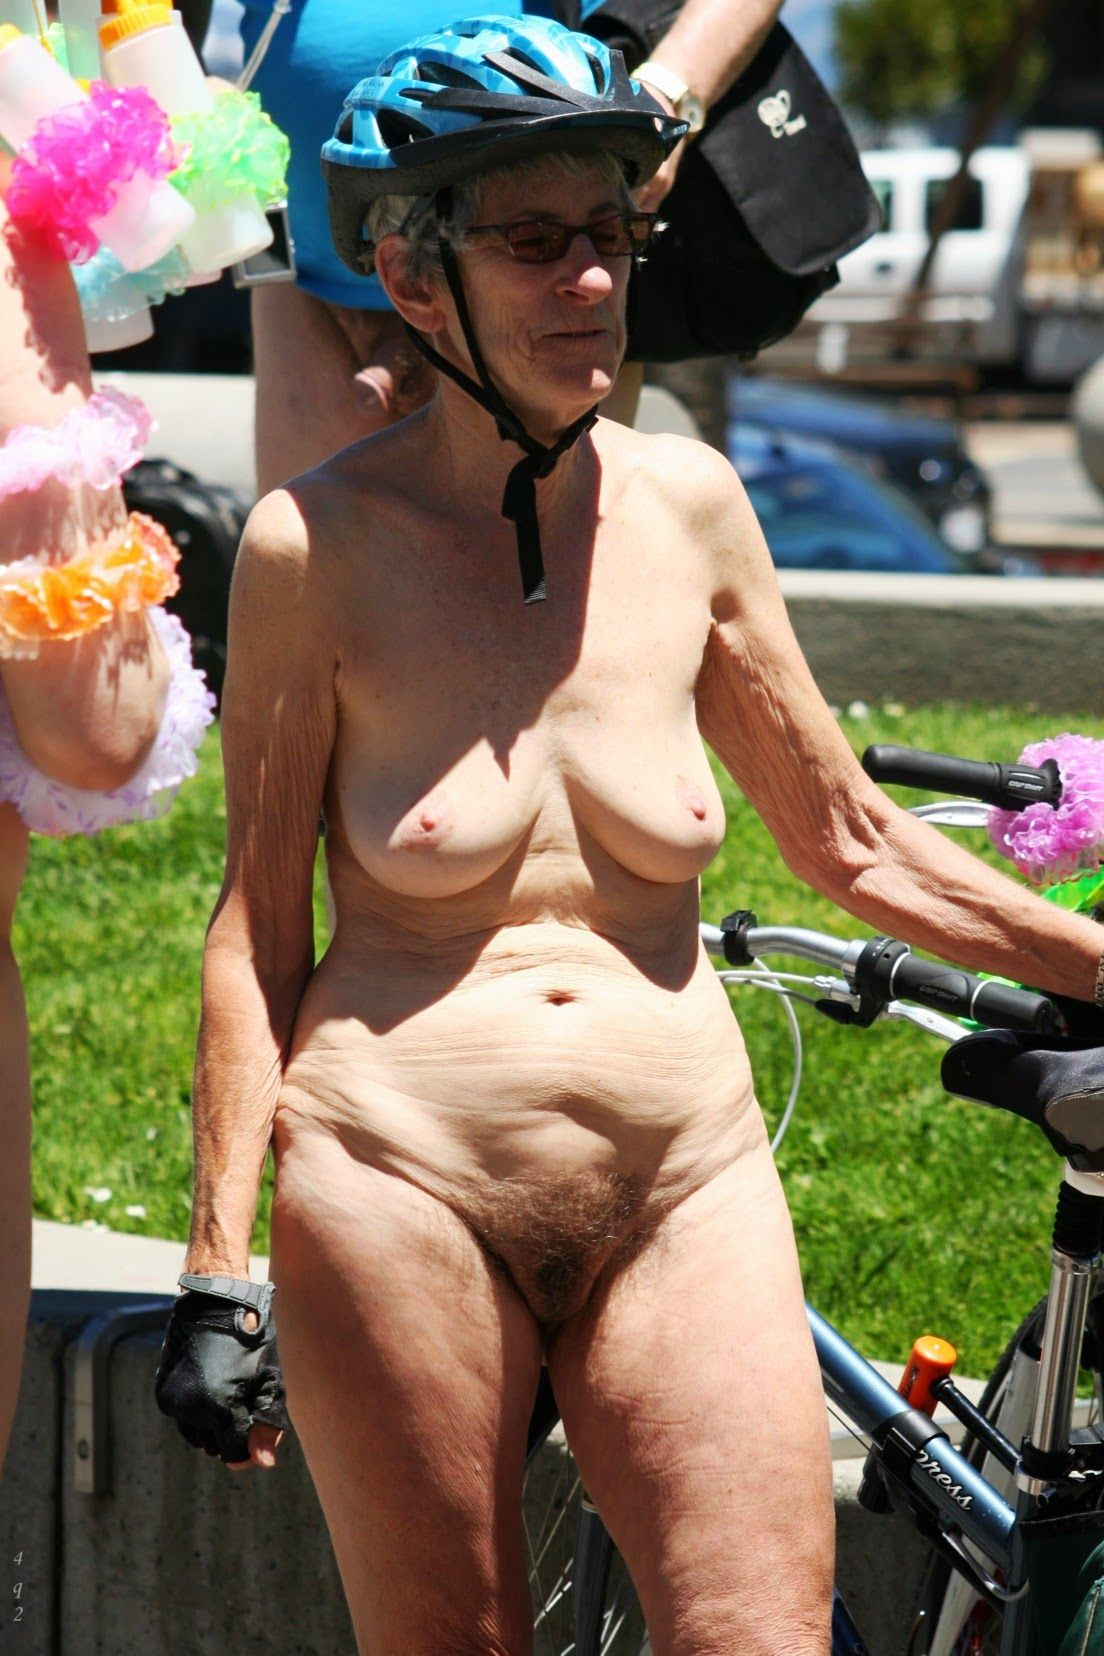 granny solo : photo | ню велосипедное | pinterest | soloing